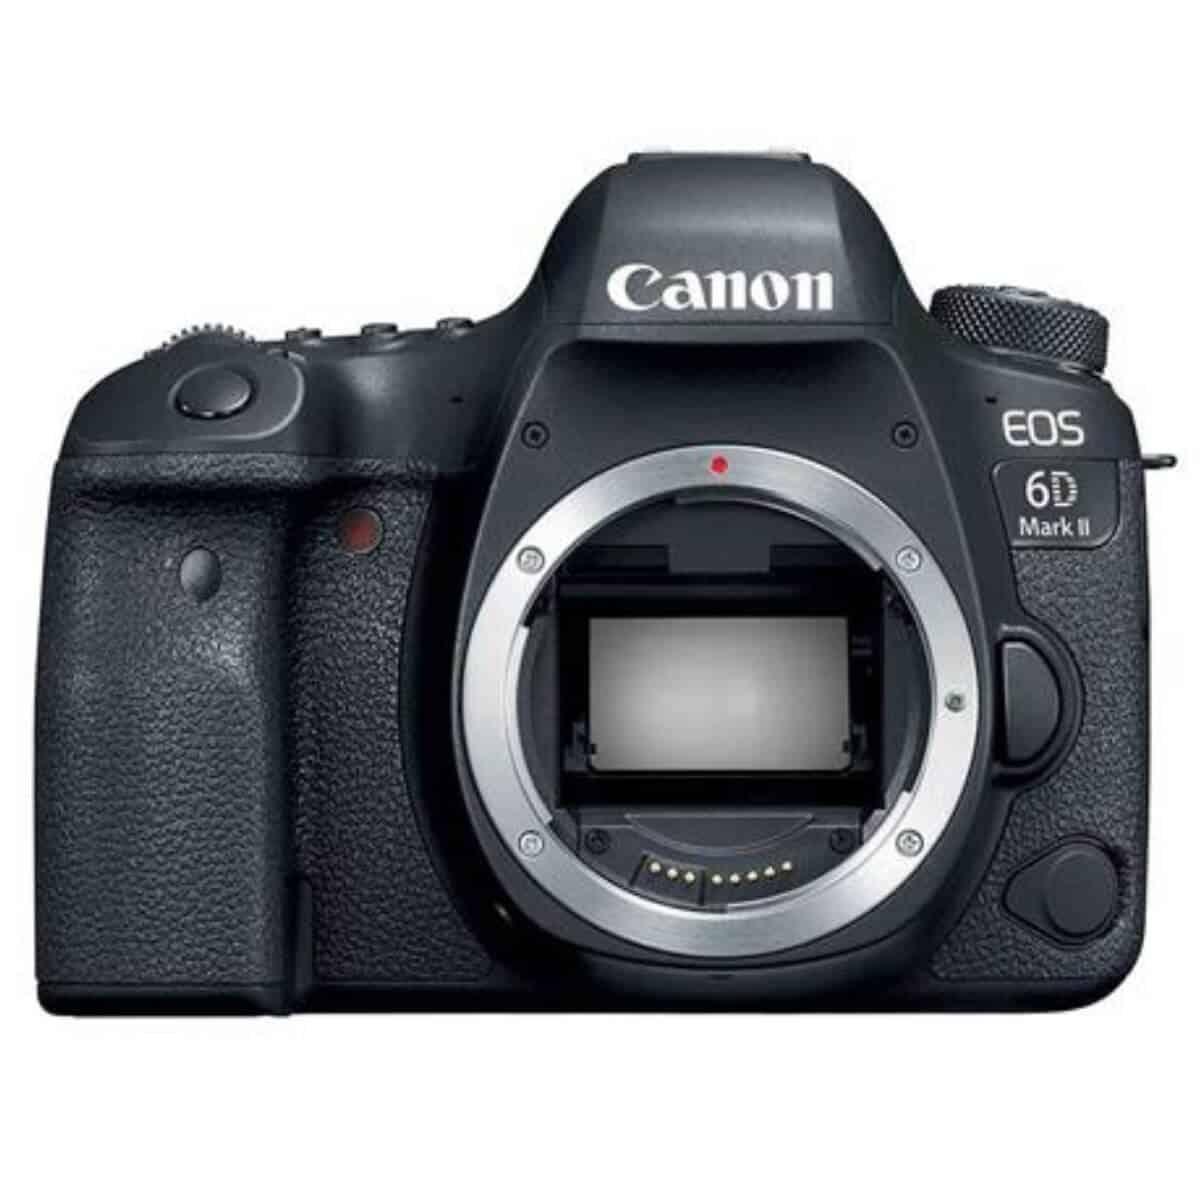 Canon 6D Mark II camera.